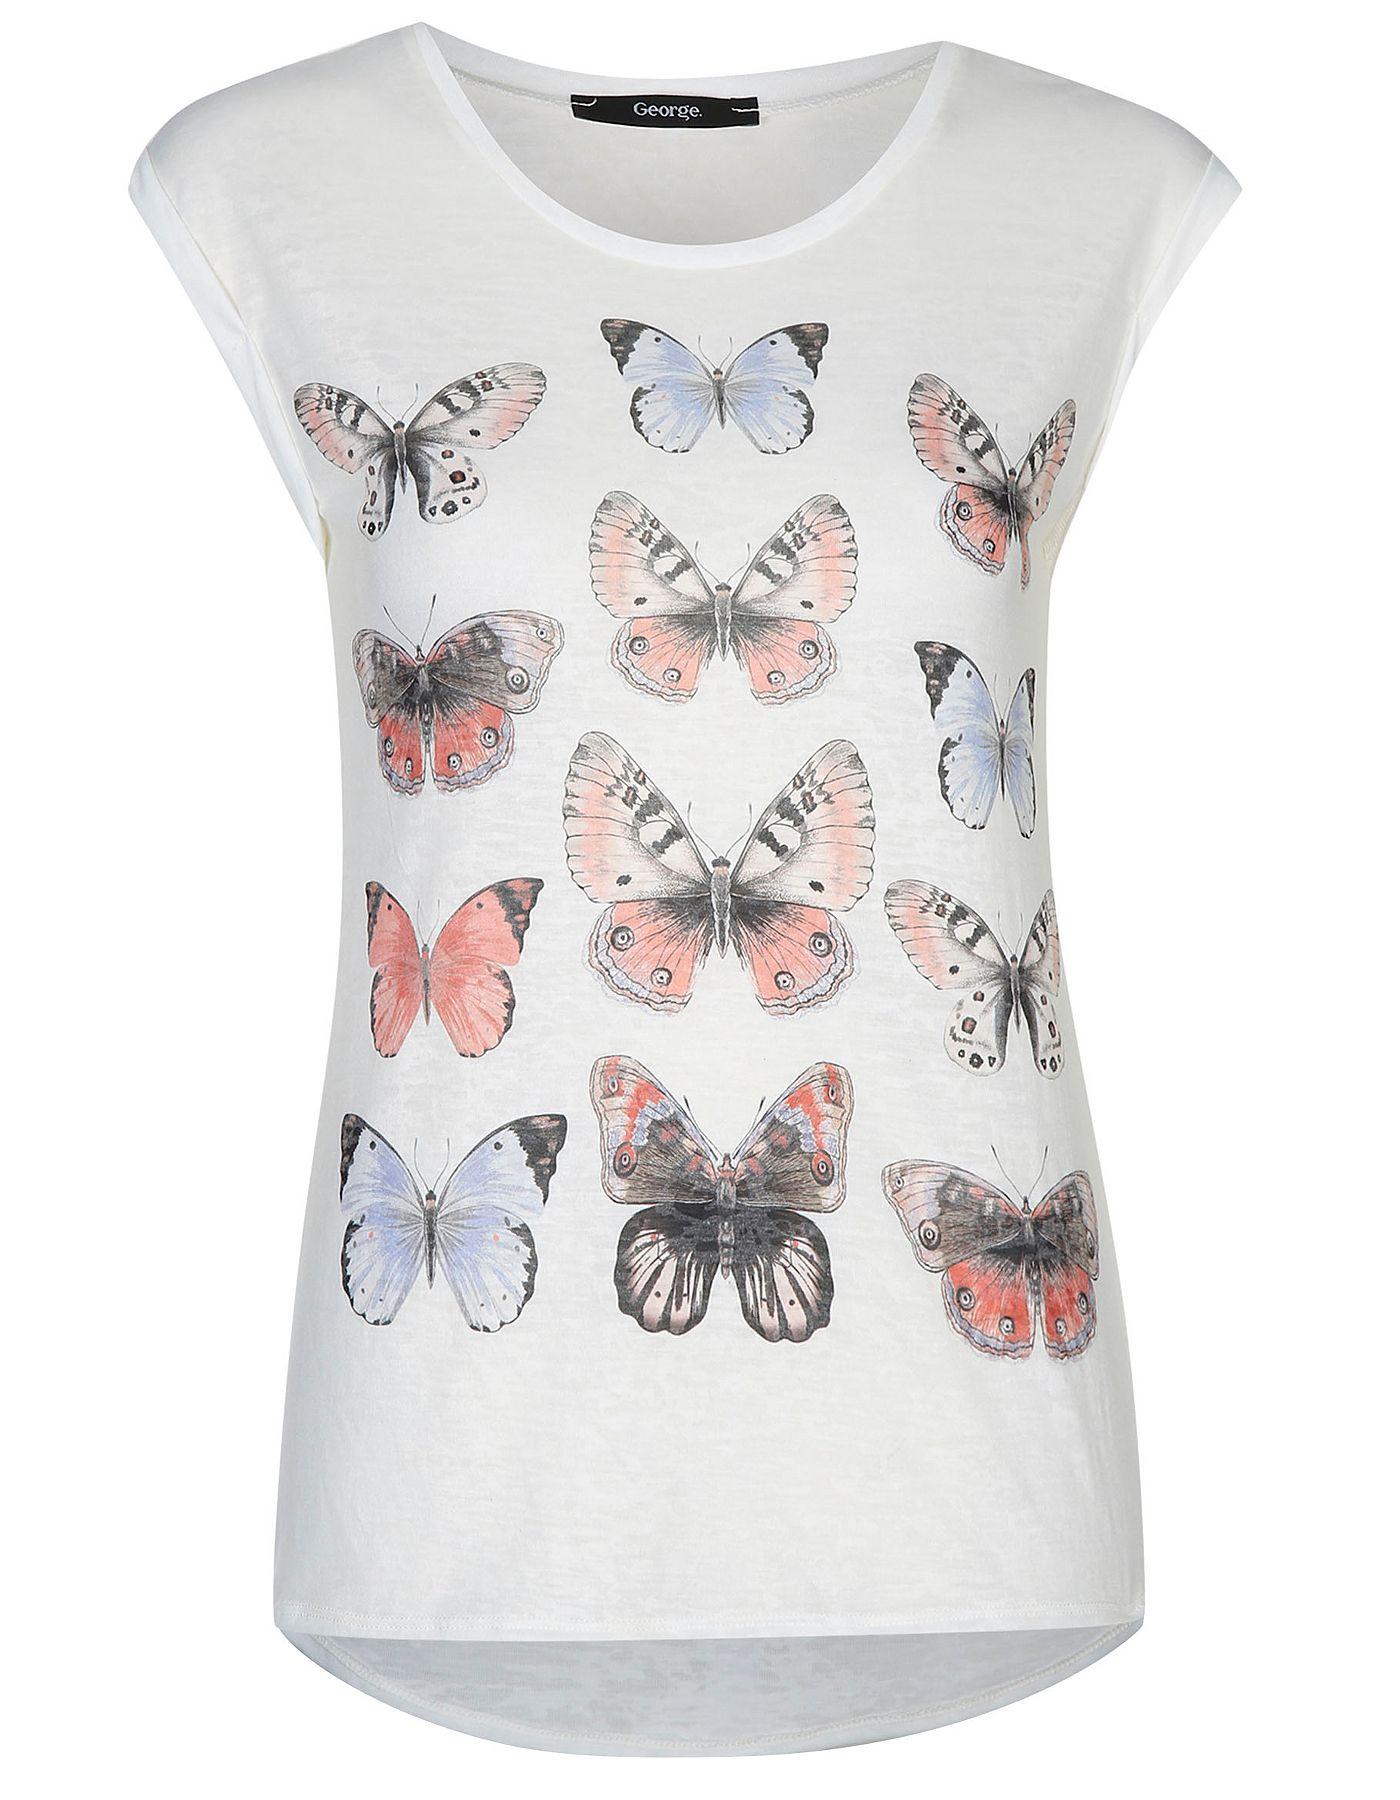 Black t shirt asda - Butterfly Print T Shirt